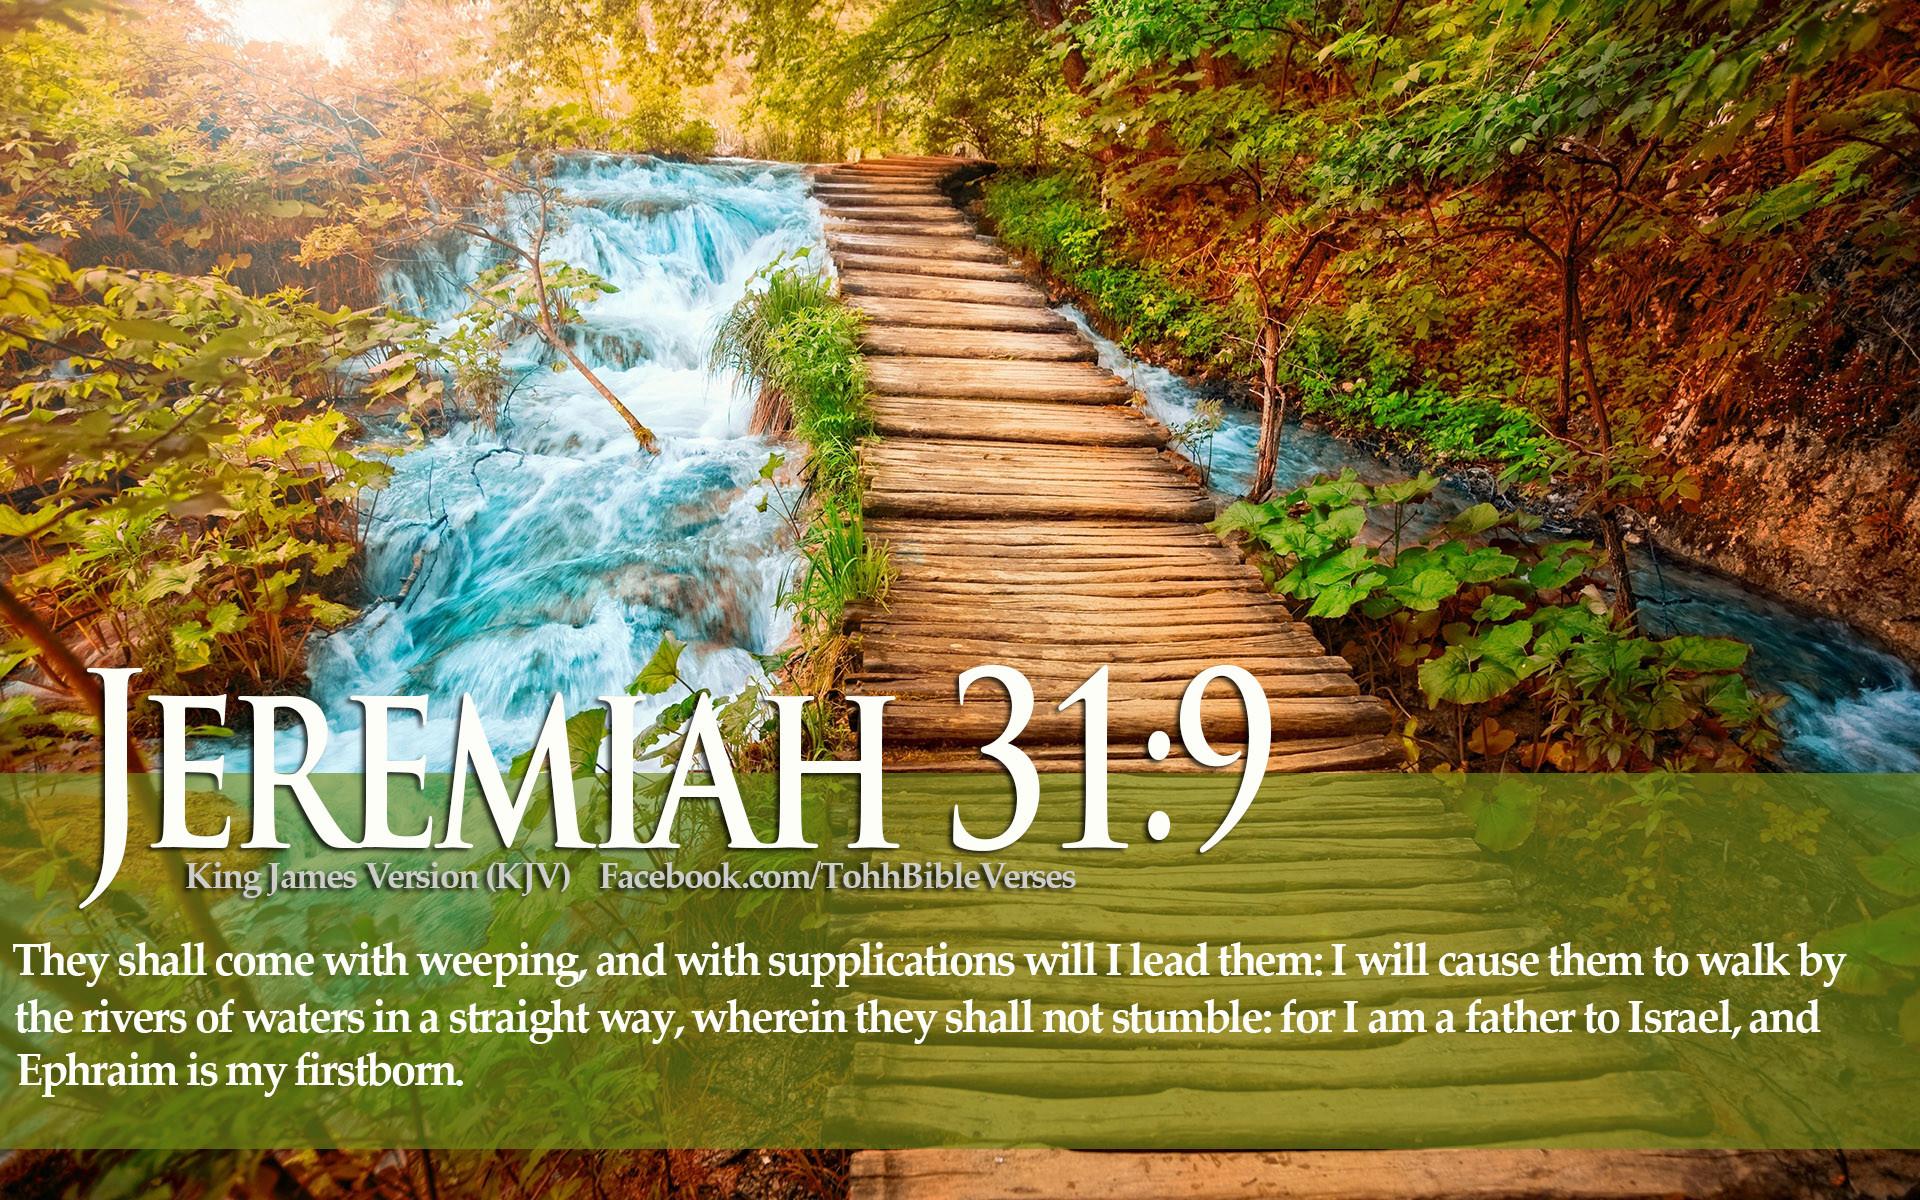 Bible-Verse-Love-Jeremiah-31-9-River-Landscape-